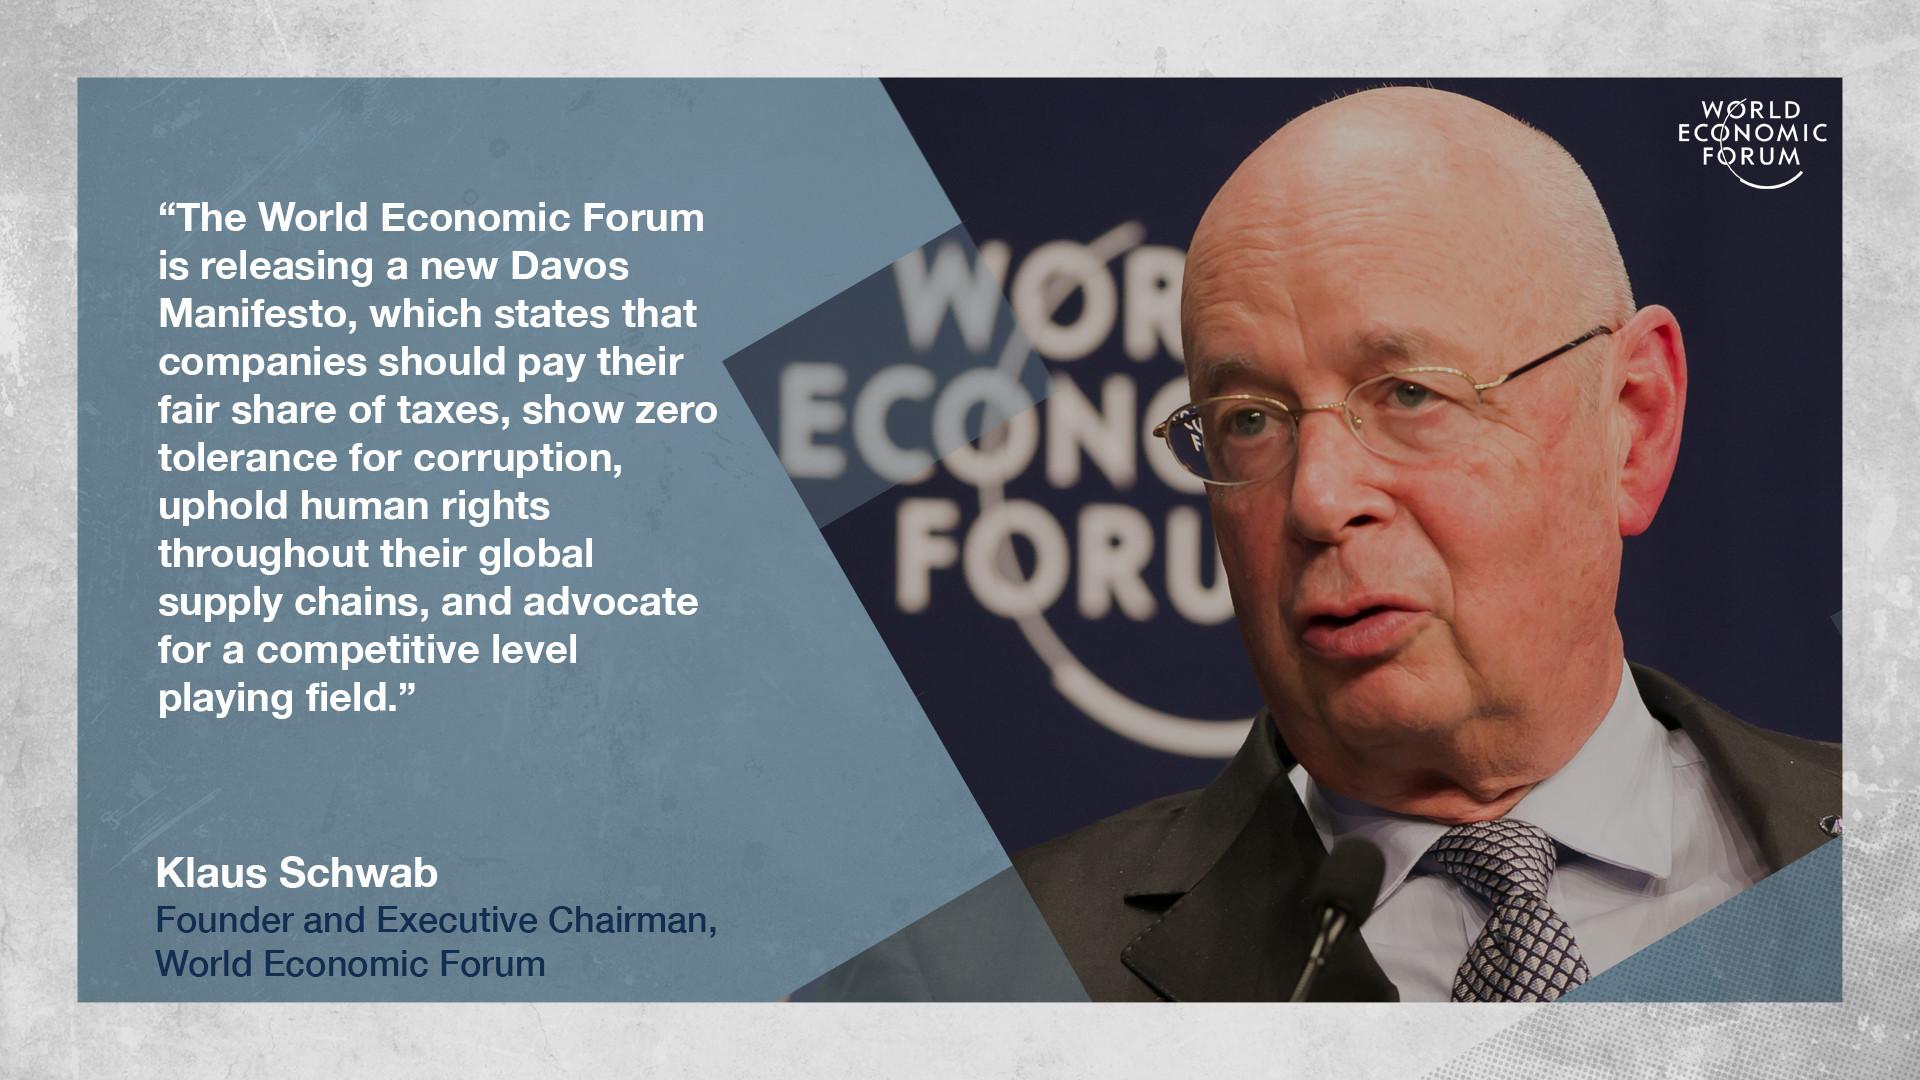 Klaus Schwab Davos Manifesto 2019